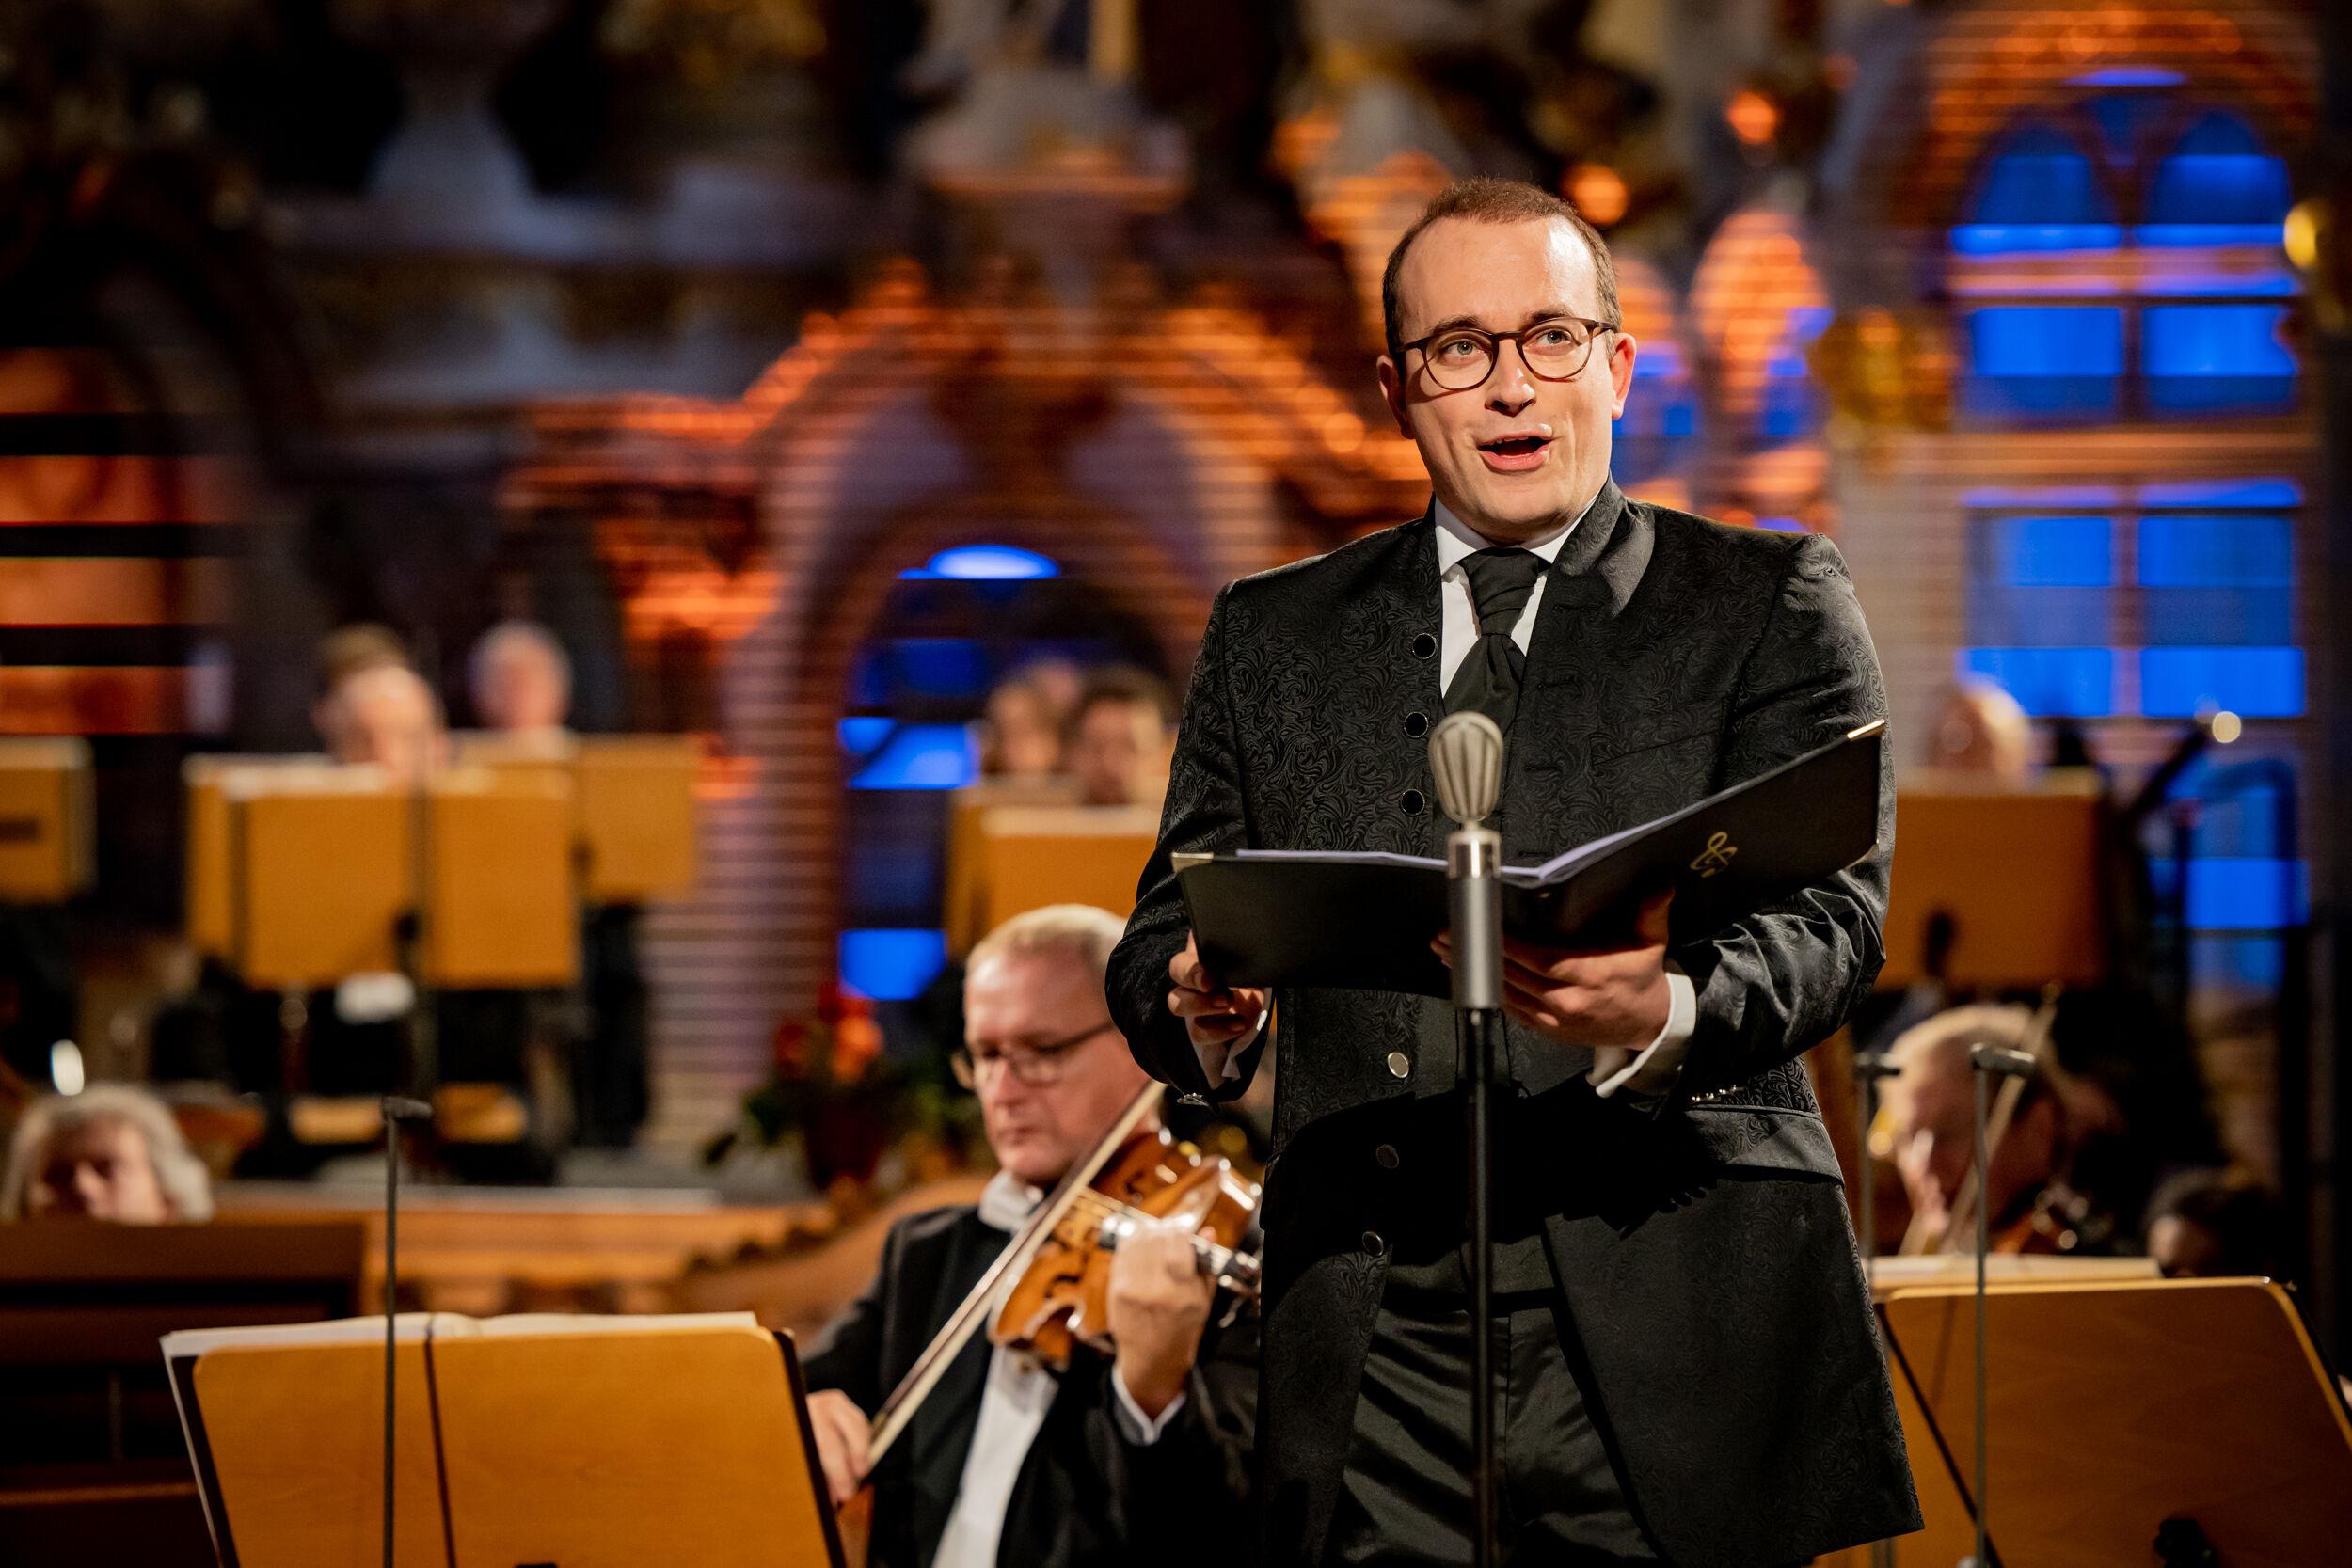 ZDF Adventskonzert - Frauenkirche Dresden 11.2020 - by Dita Vollmond